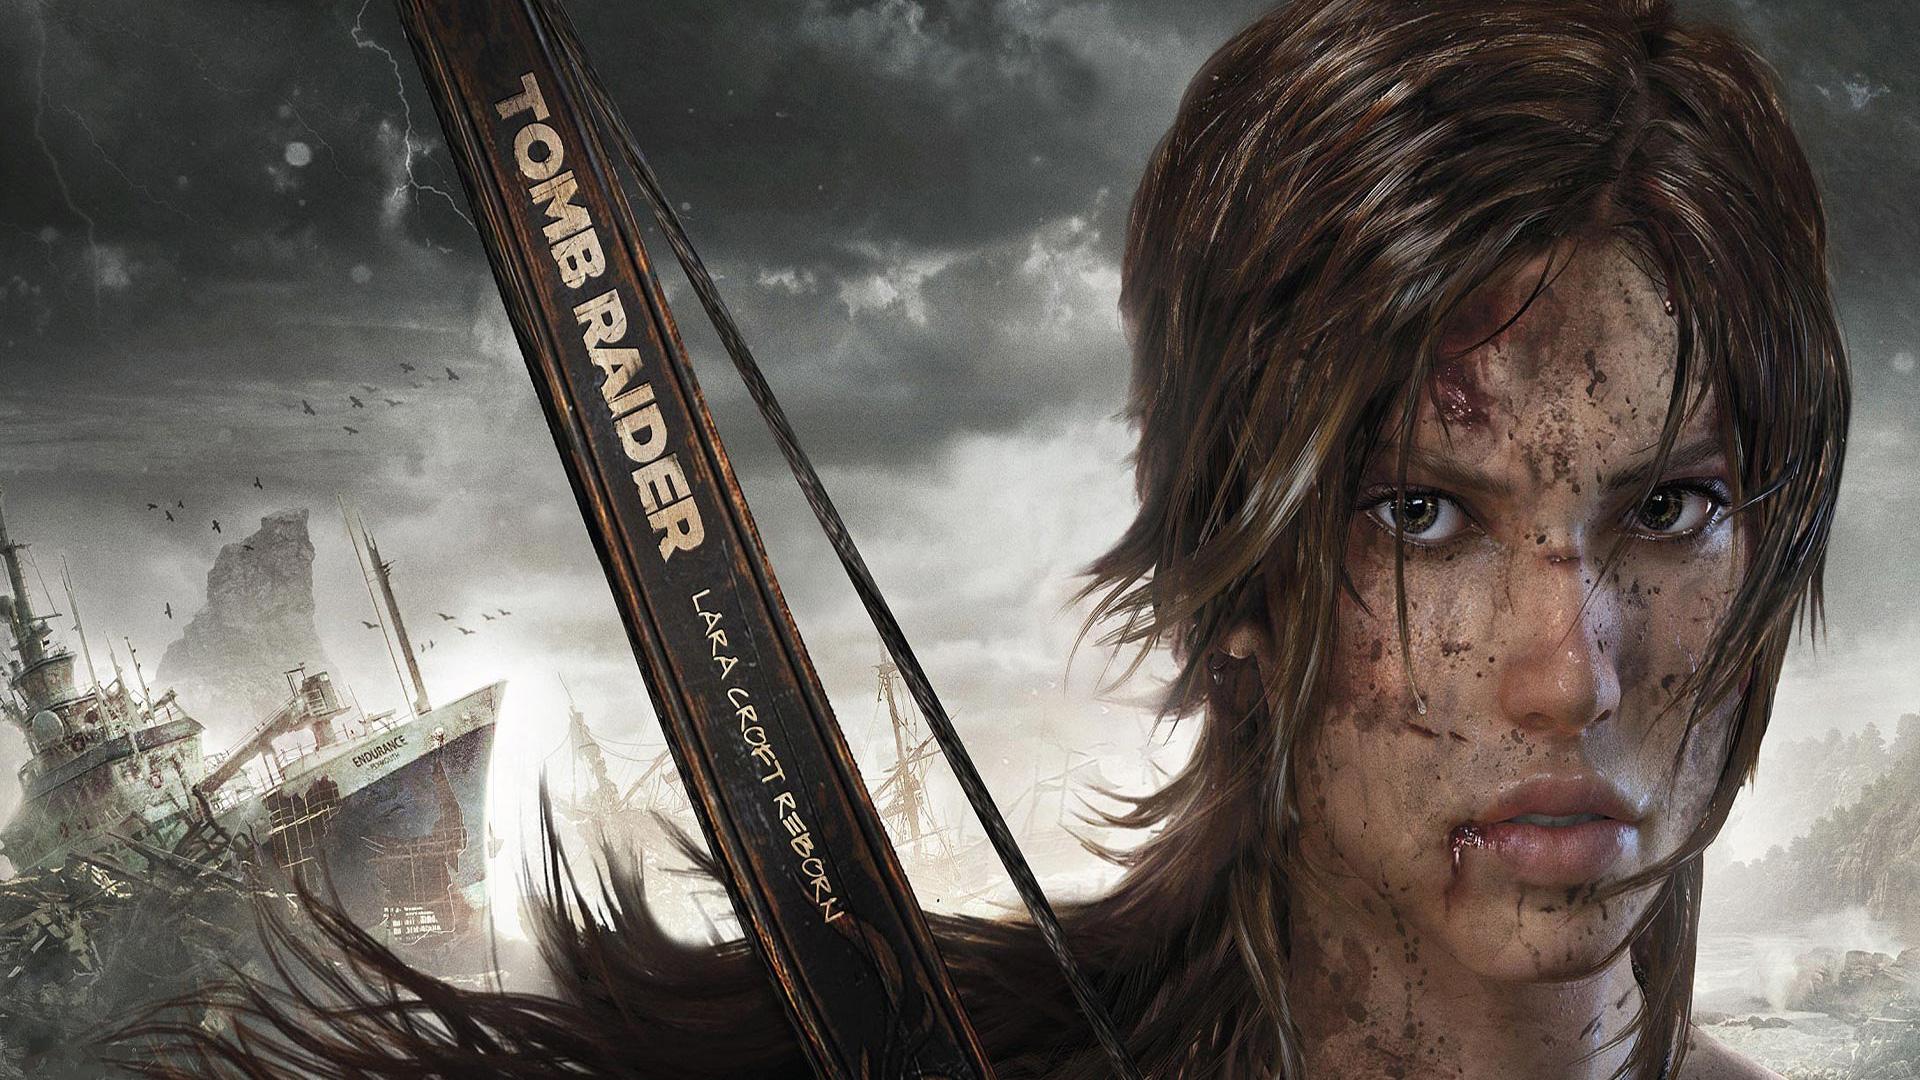 Tomb Raider wallpaper 1